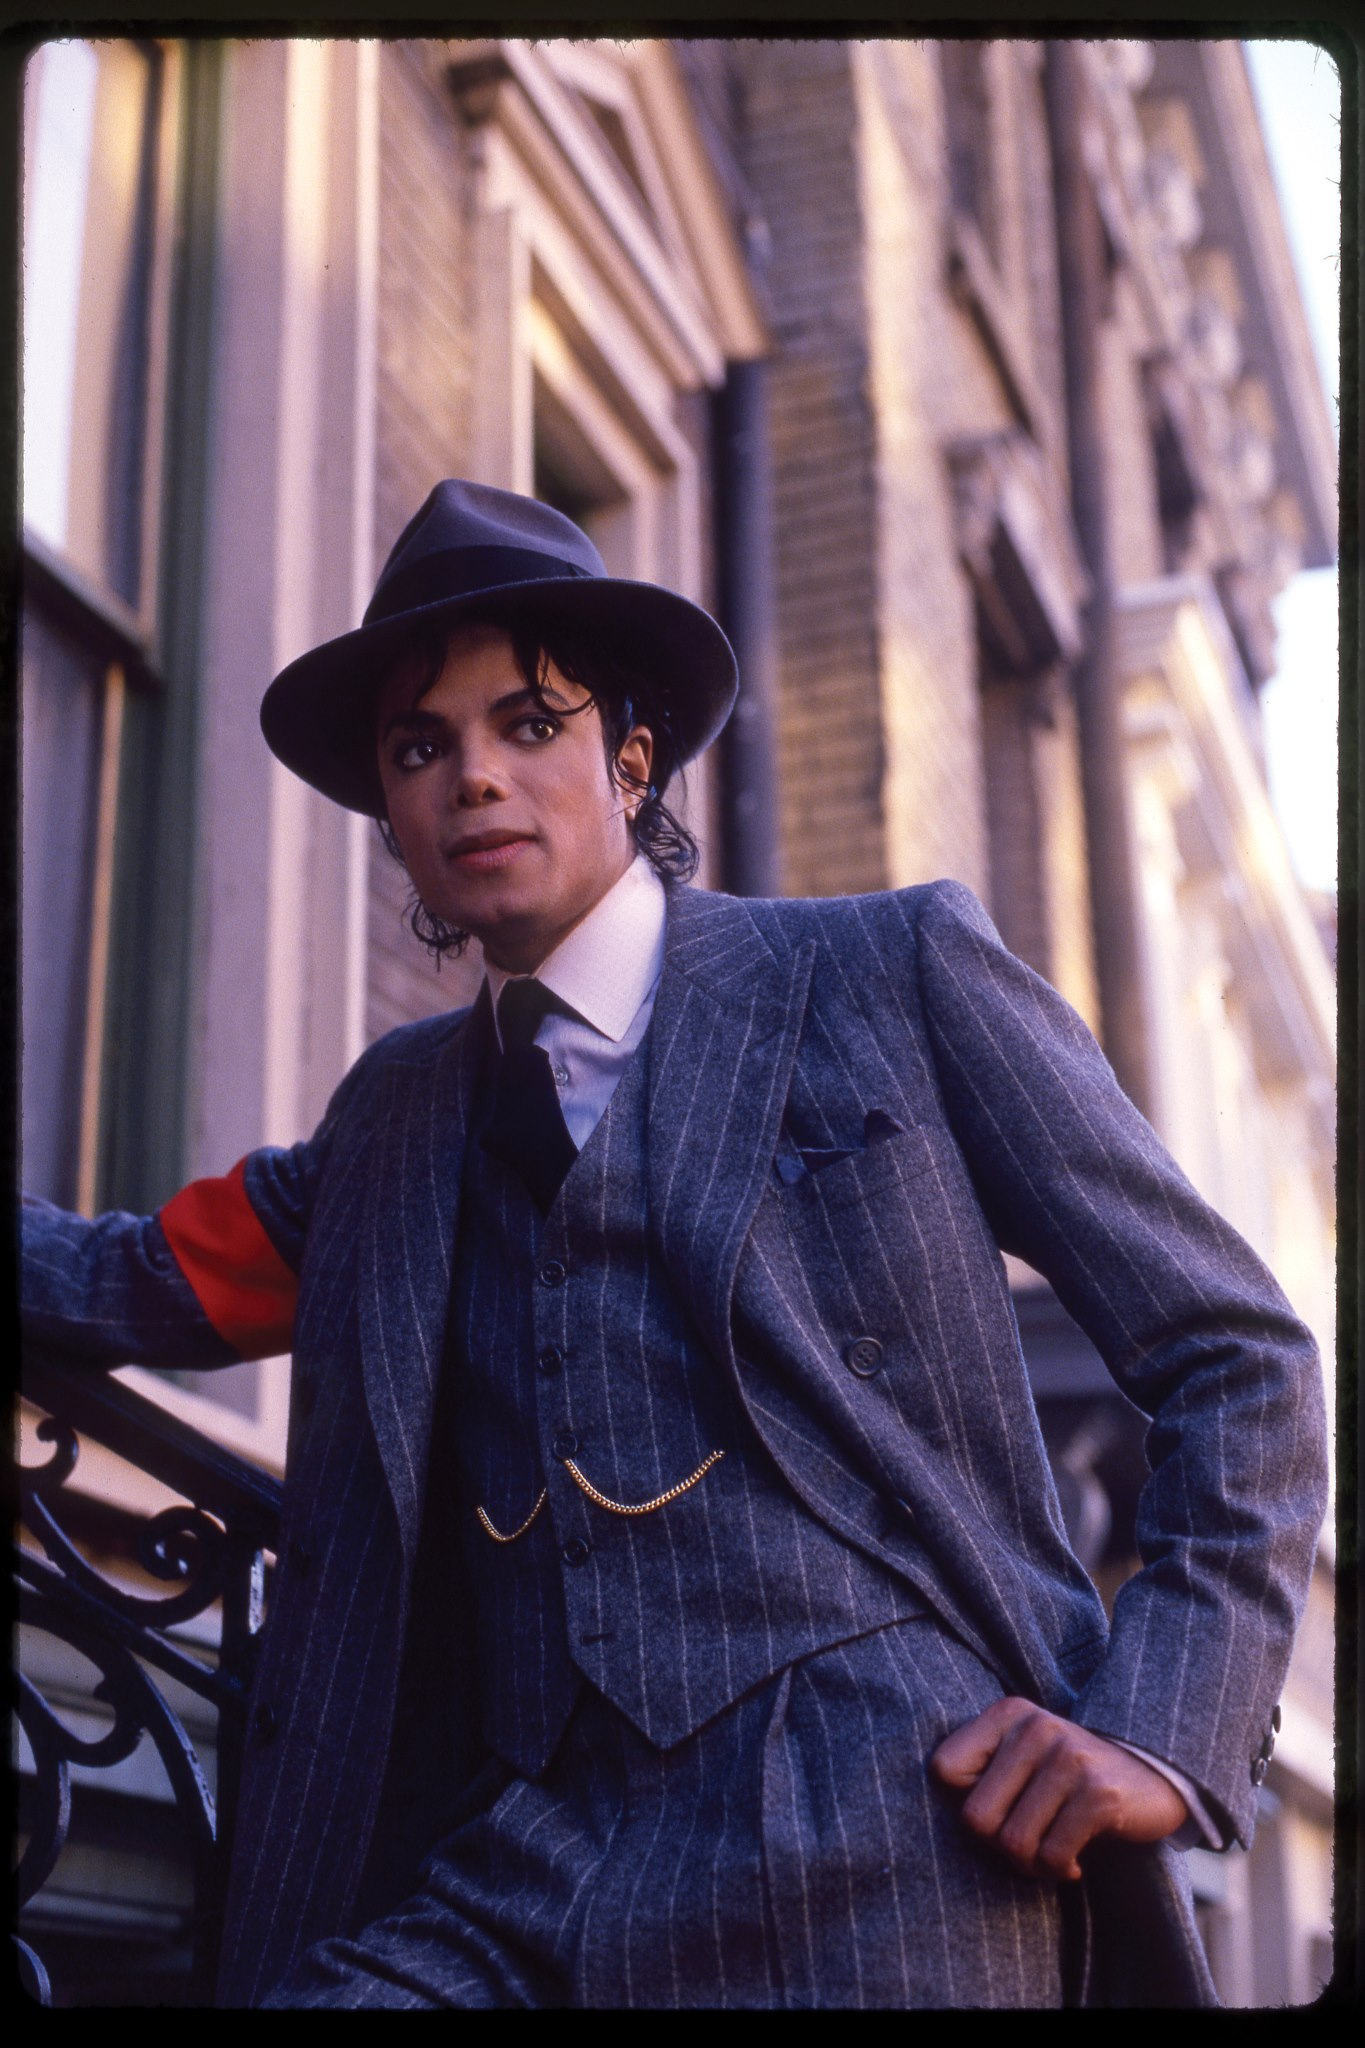 ♥♥ MICHAEL JACKSON ♥♥ (HIGH QUALITY PIC) :)